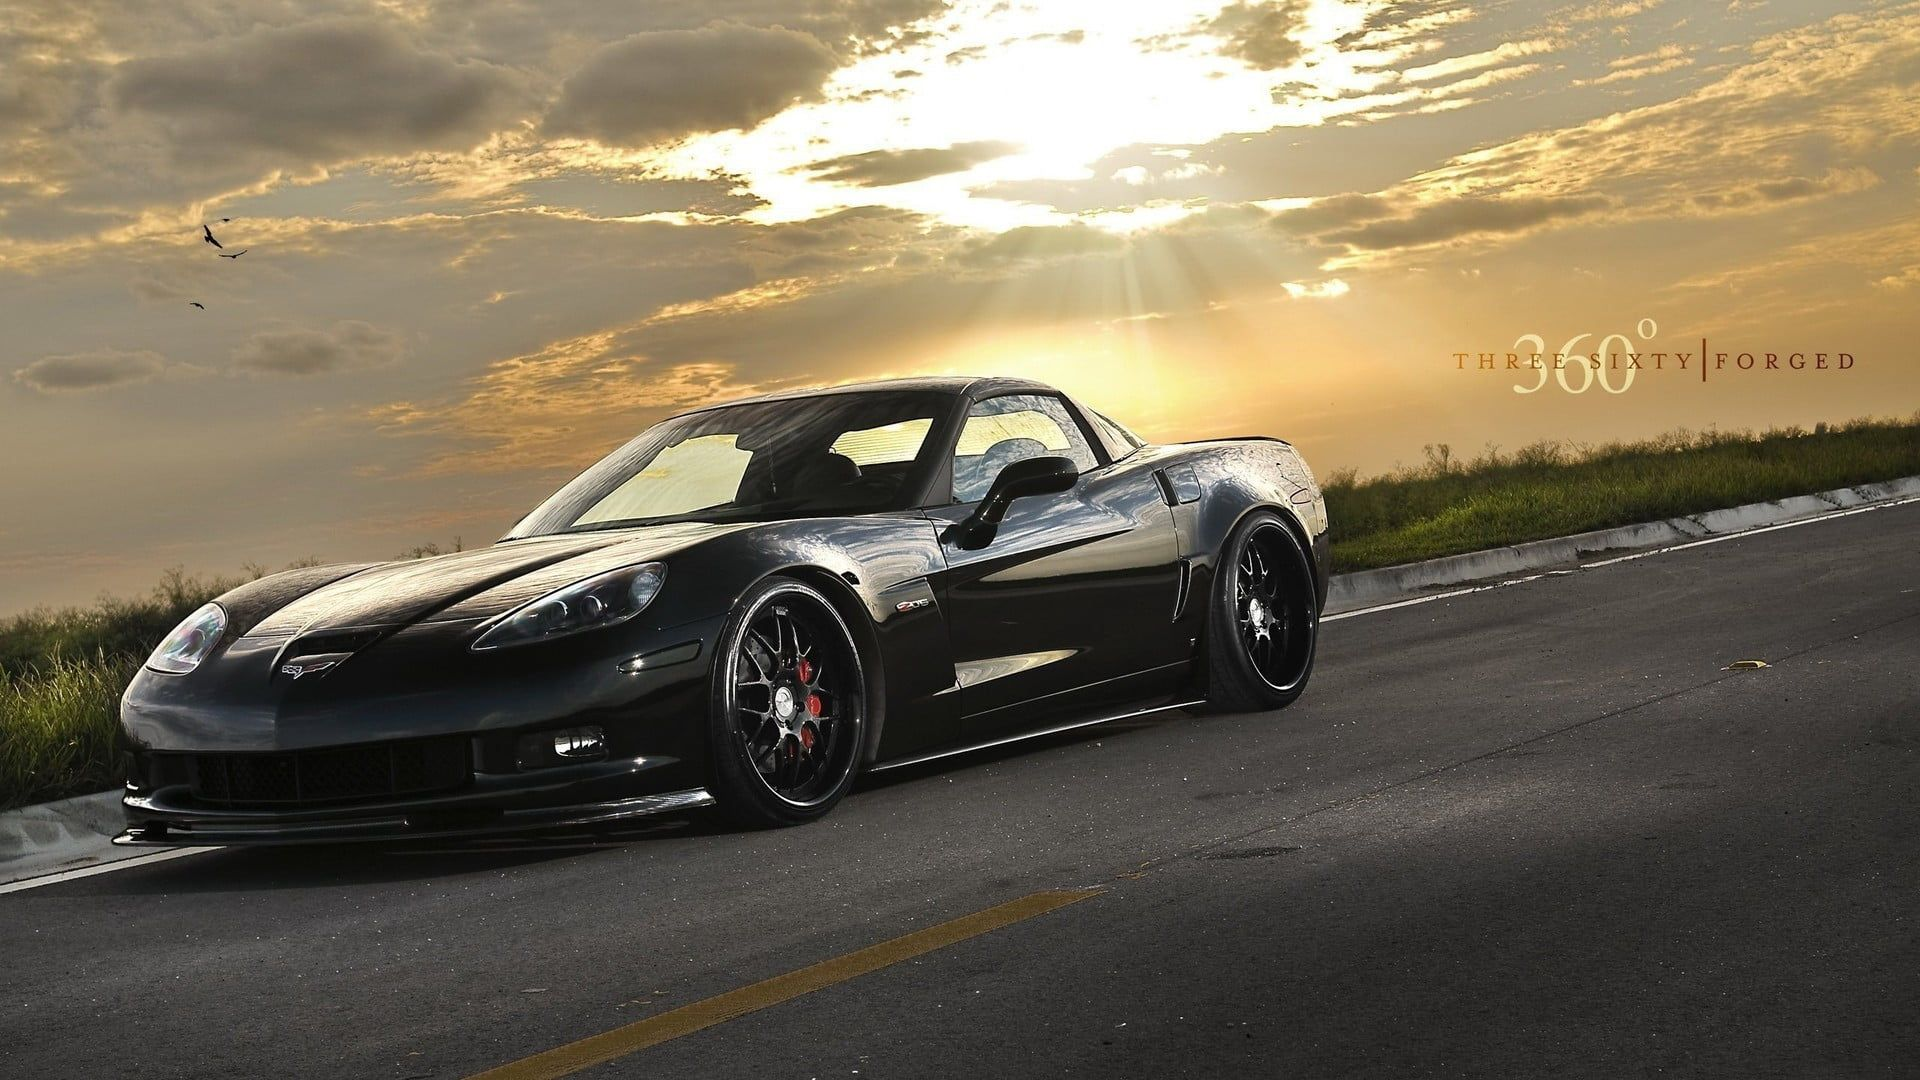 C6 Corvette Wallpapers - Top Free C6 Corvette Backgrounds